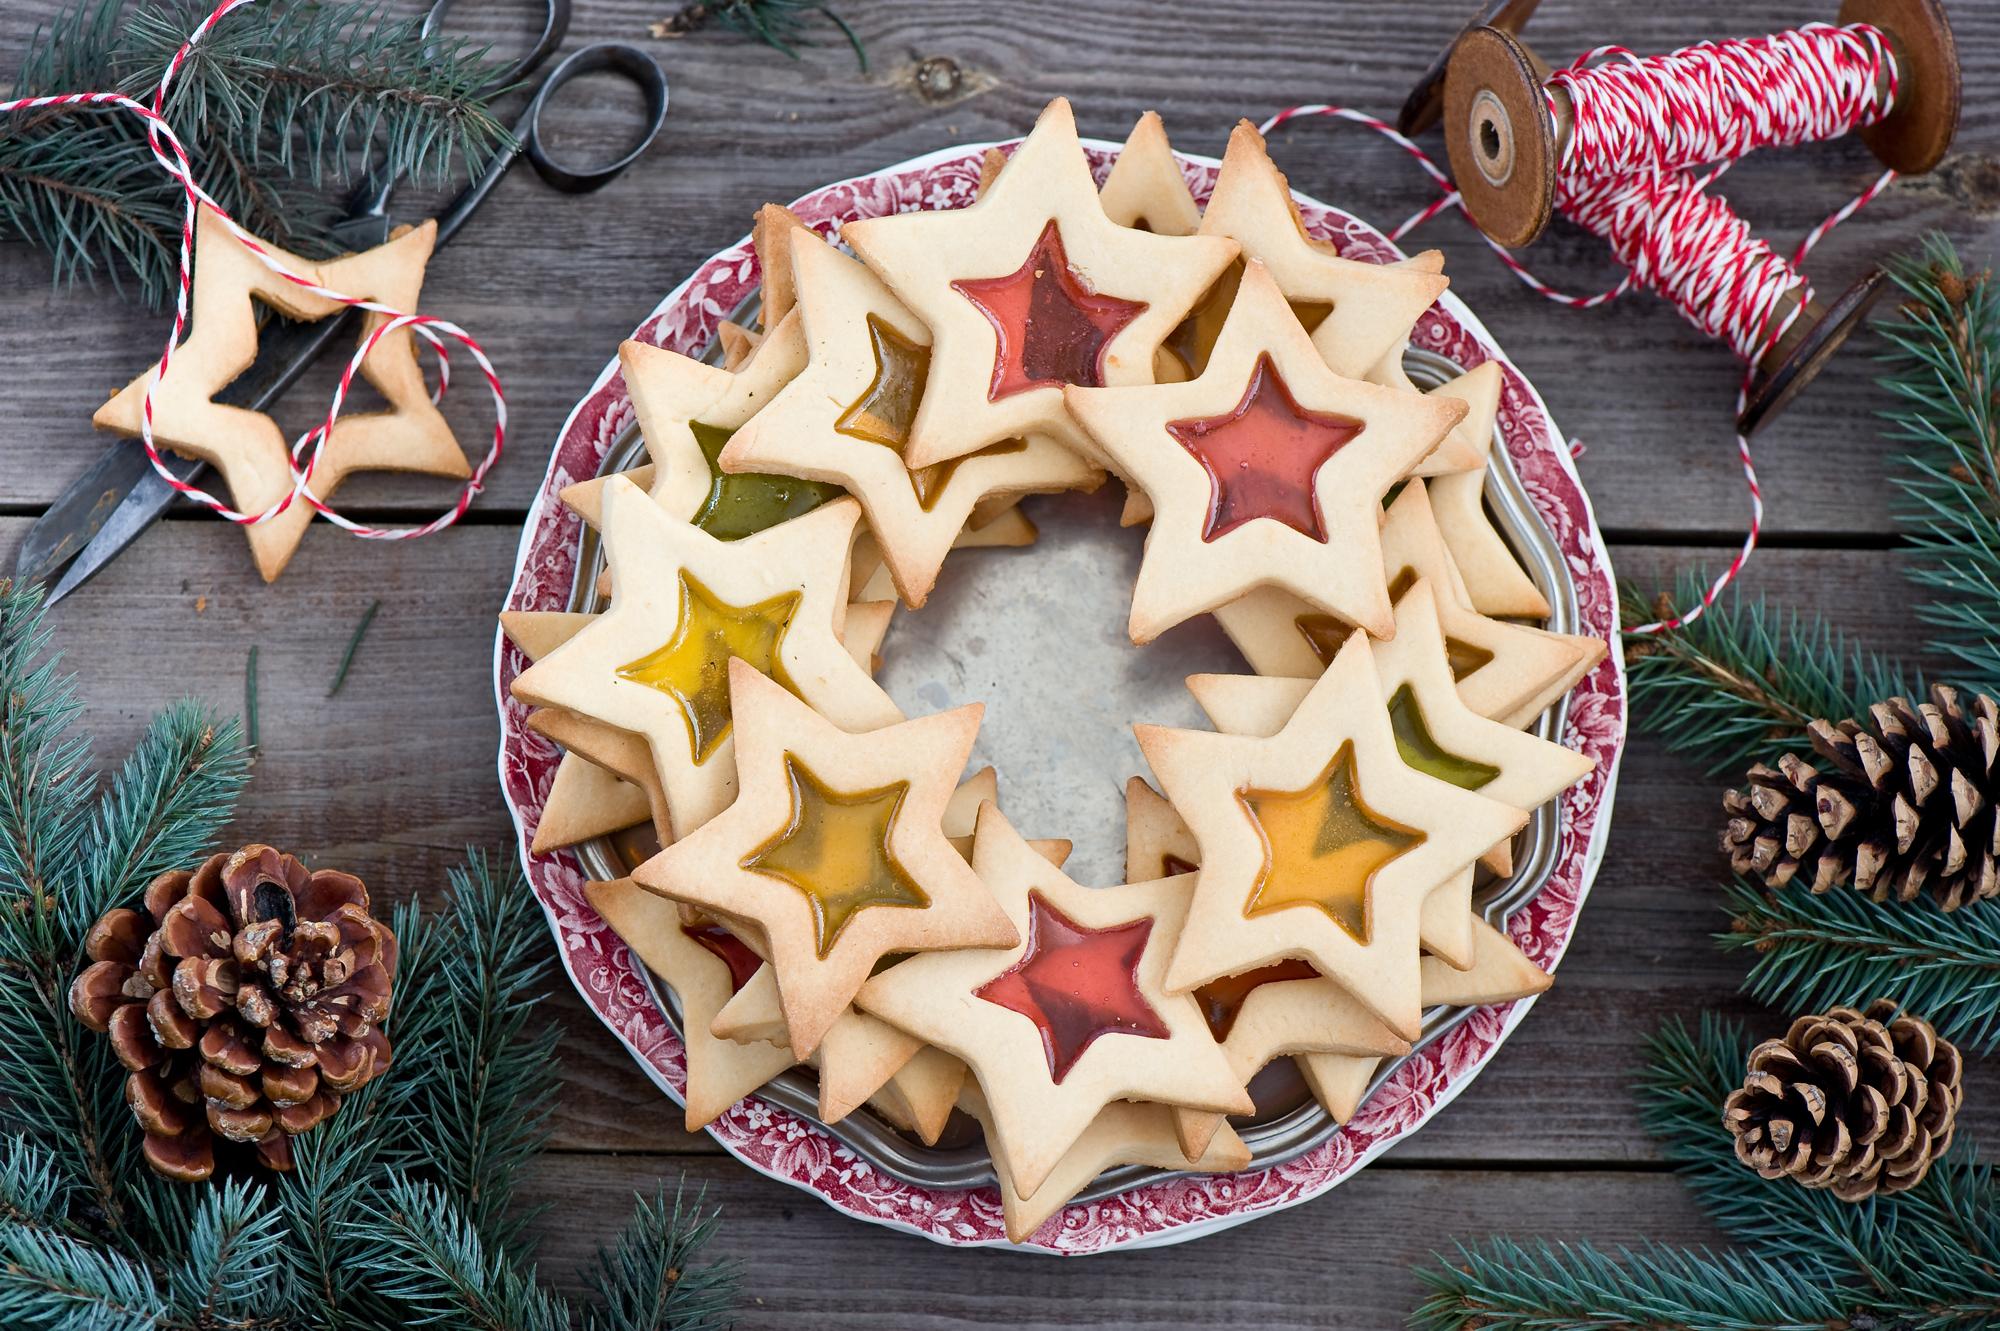 печенье звезды тарелка  № 2926834 без смс